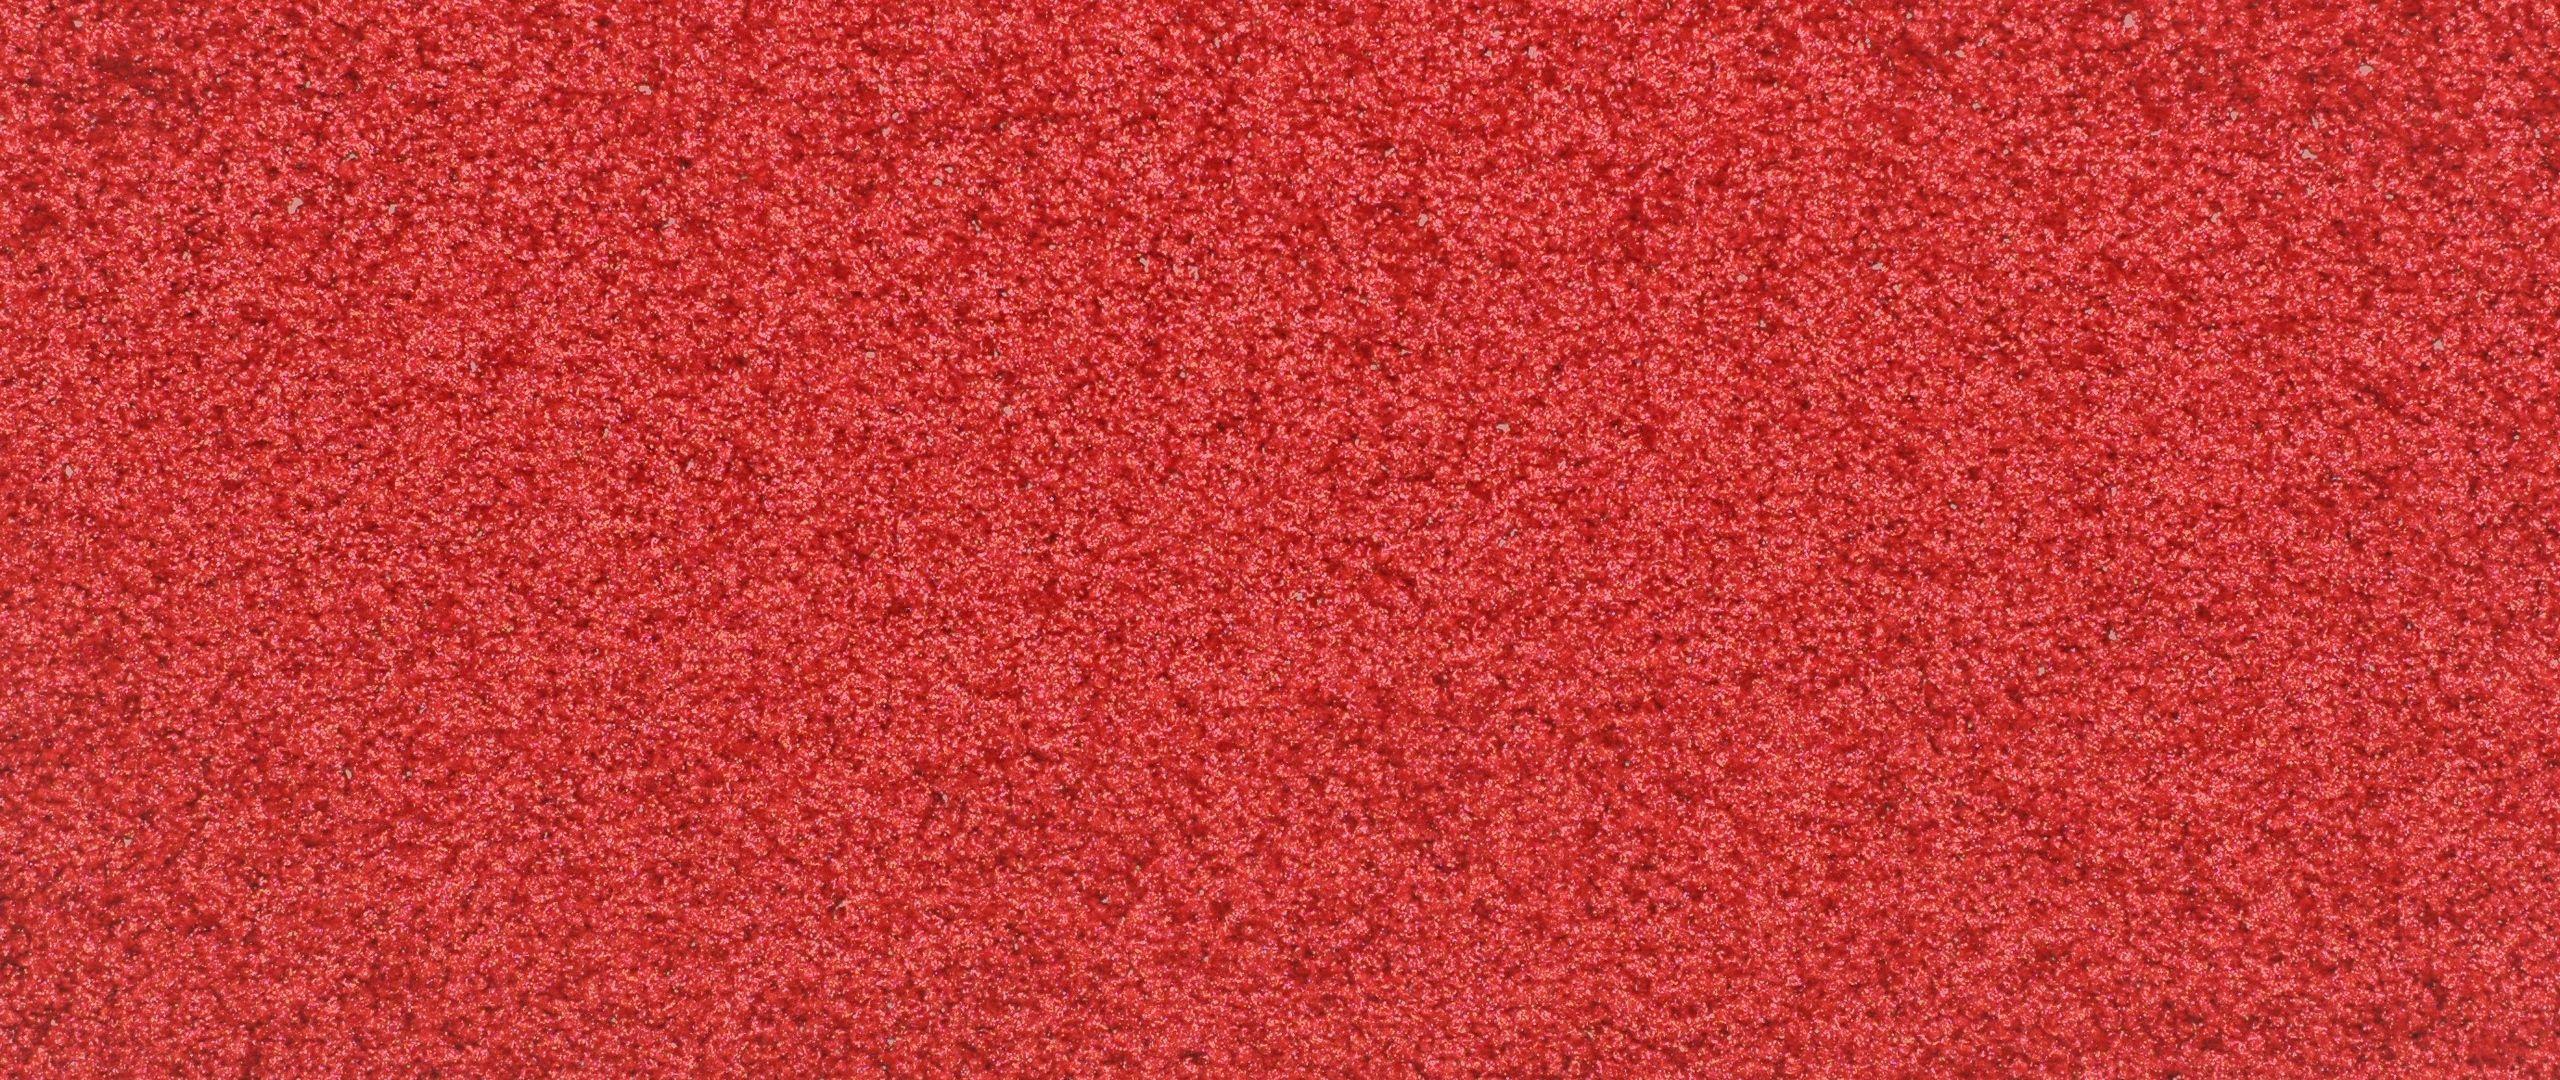 Red Carpet Texture Pattern Design Inspiration 219381 Other ...  Red Carpet Texture Pattern